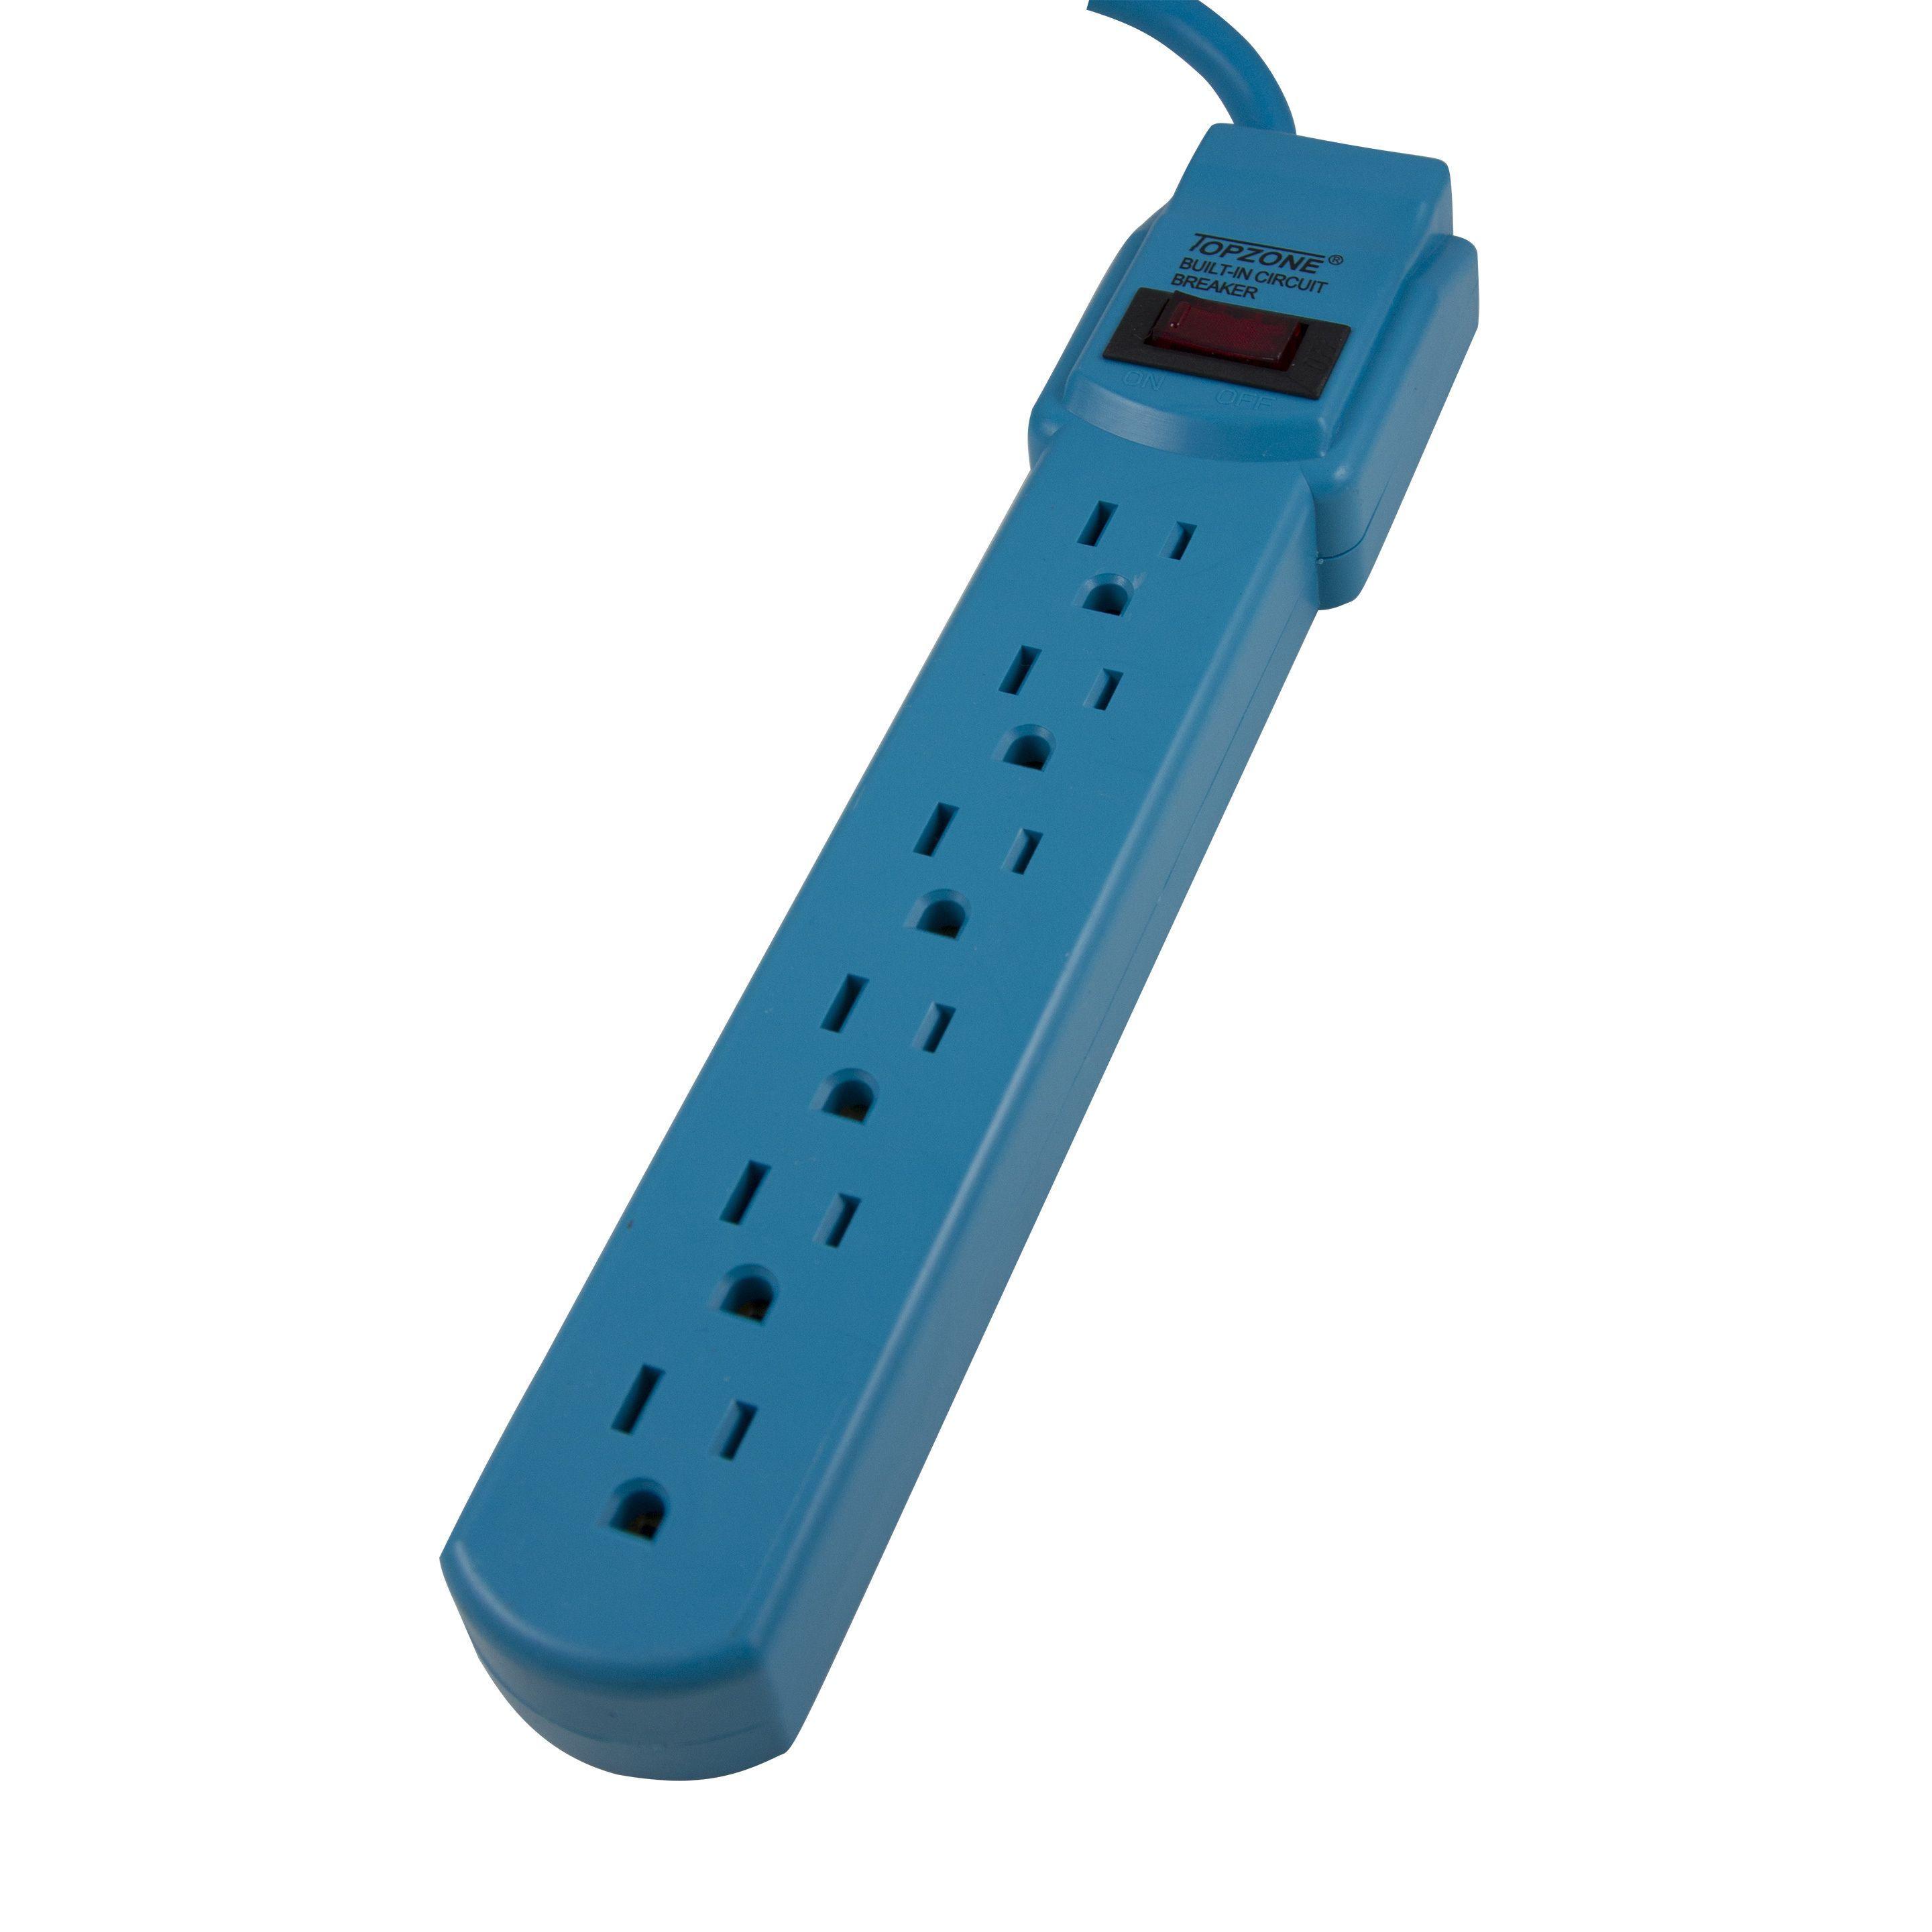 Topzone 15 Feet 6 Outlet Power Strip Circuit Breaker Beige To Schematic Blue